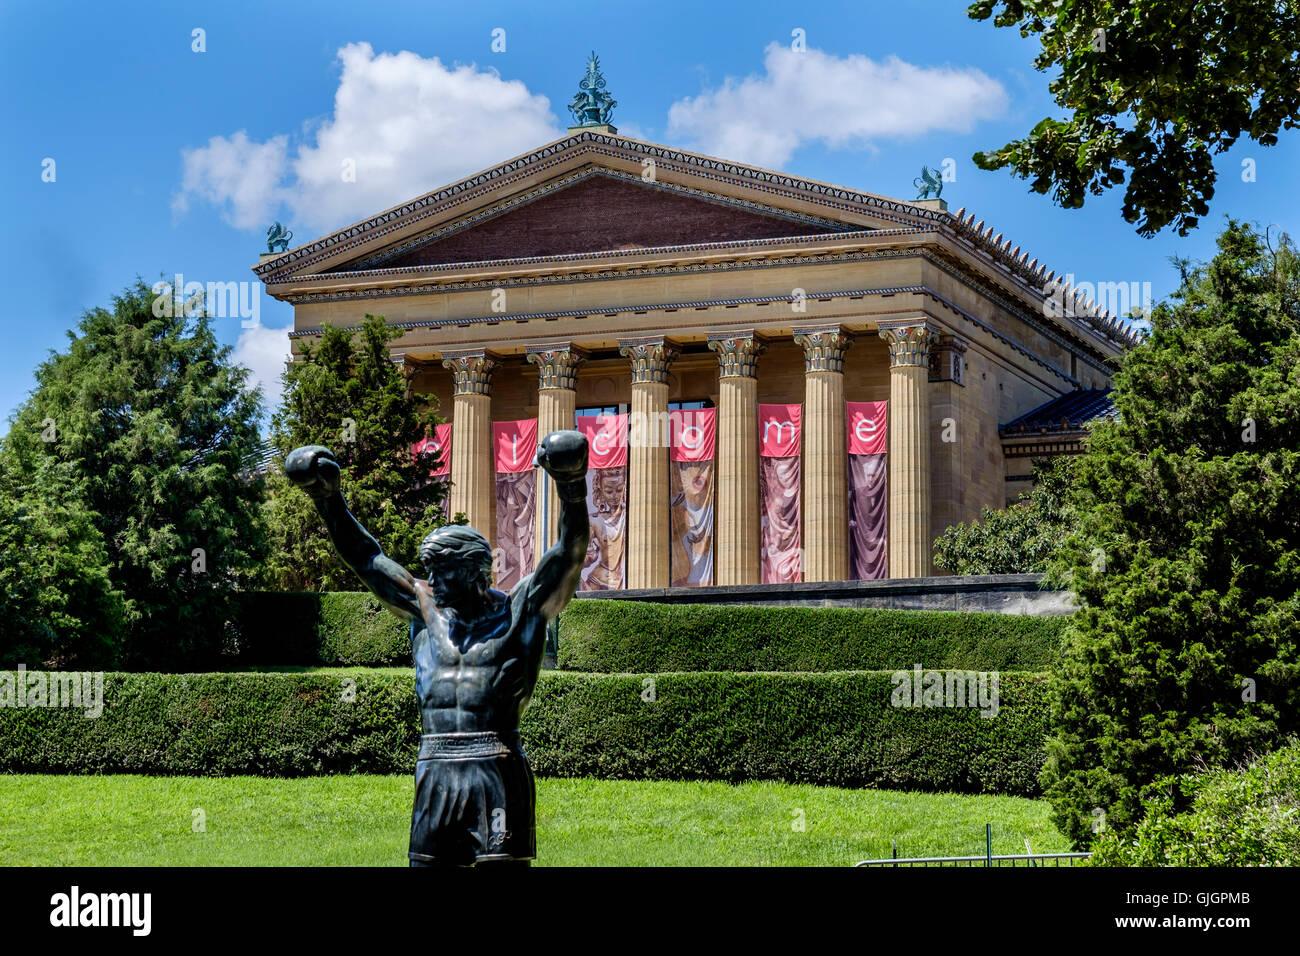 The bronze statue of Sylvester Stallone as Rocky Balboa outside the Philadelphia Museum of Art. - Stock Image